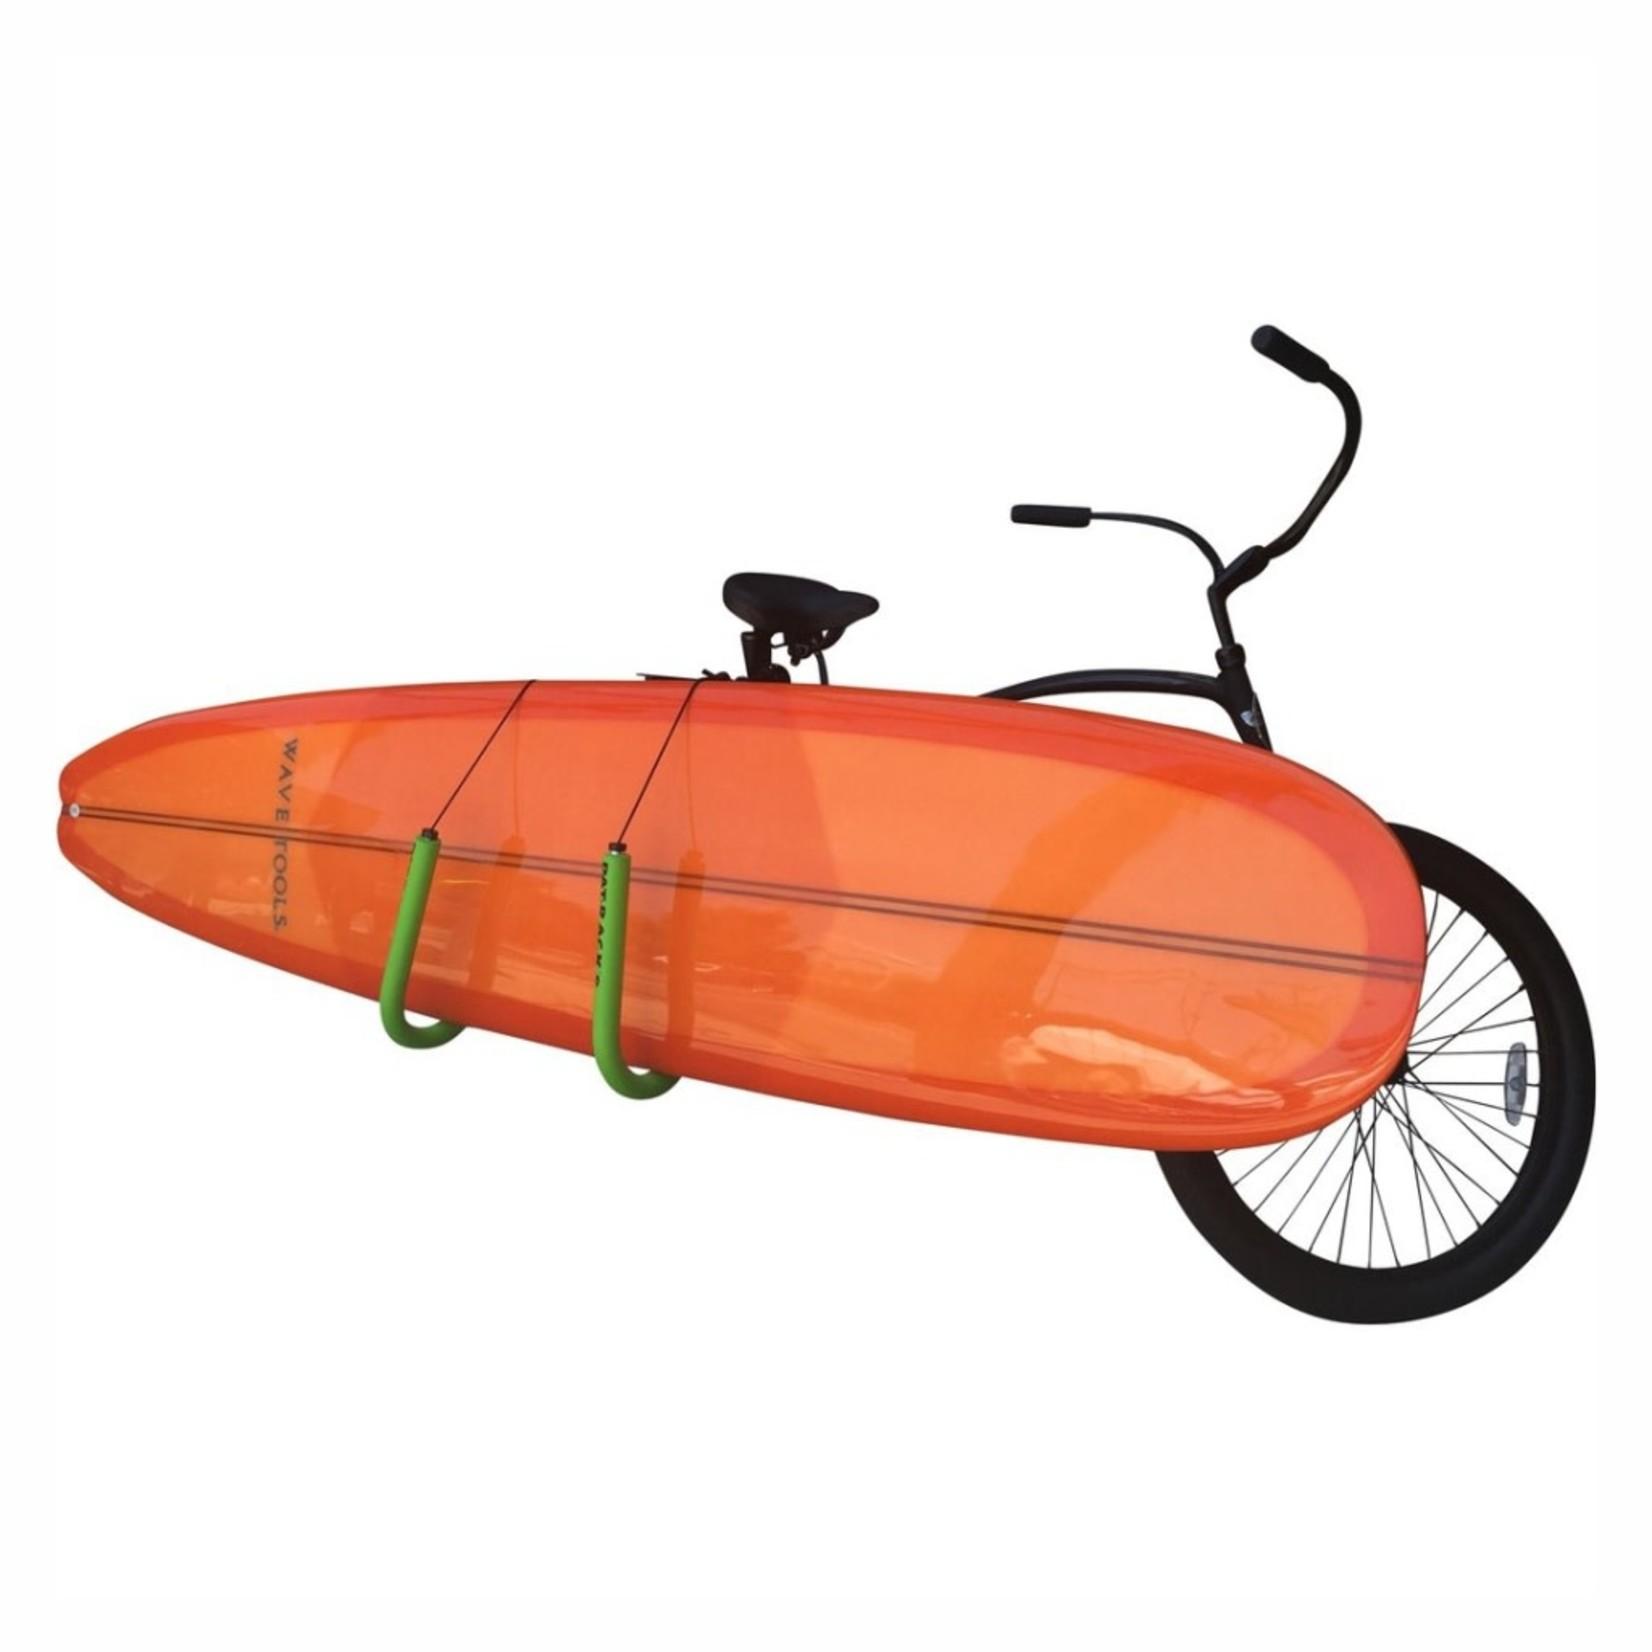 PAT-RACKS Surf Pat Racks Bicycle Rack for Shortboard Surfboards